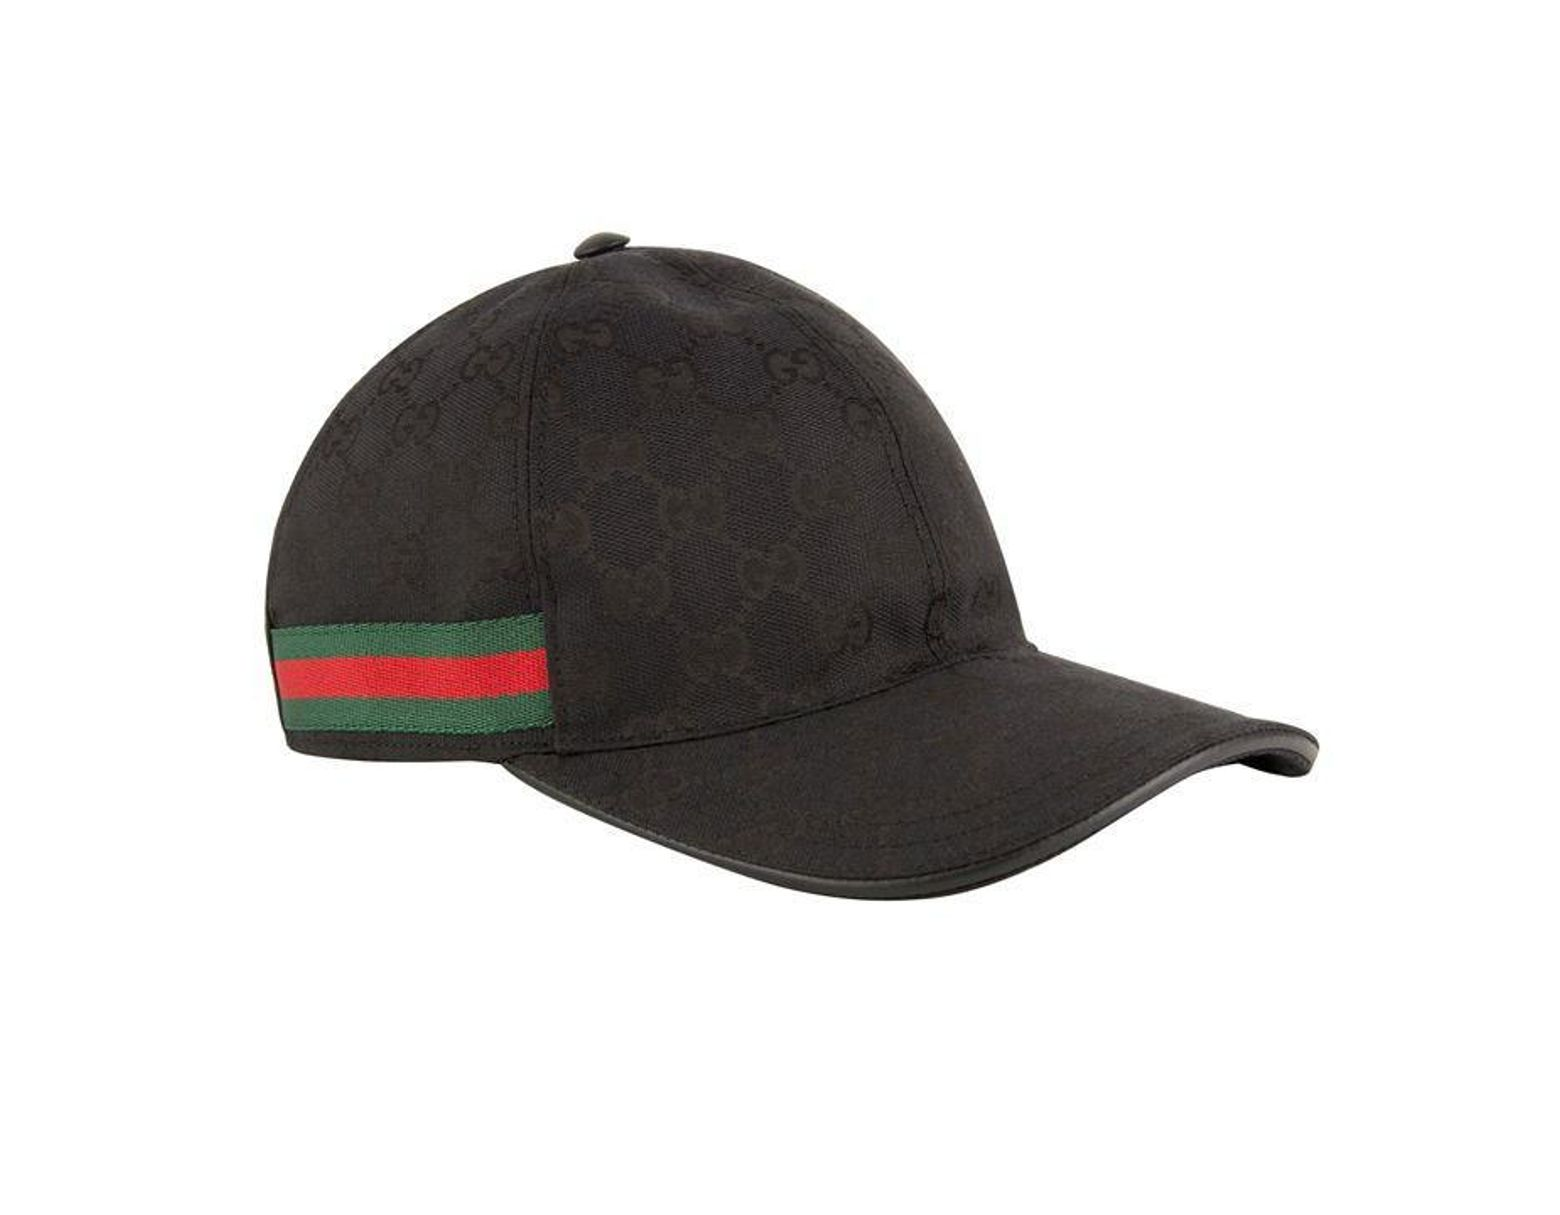 de9a71e9 Men's Black Original GG Canvas Baseball Hat